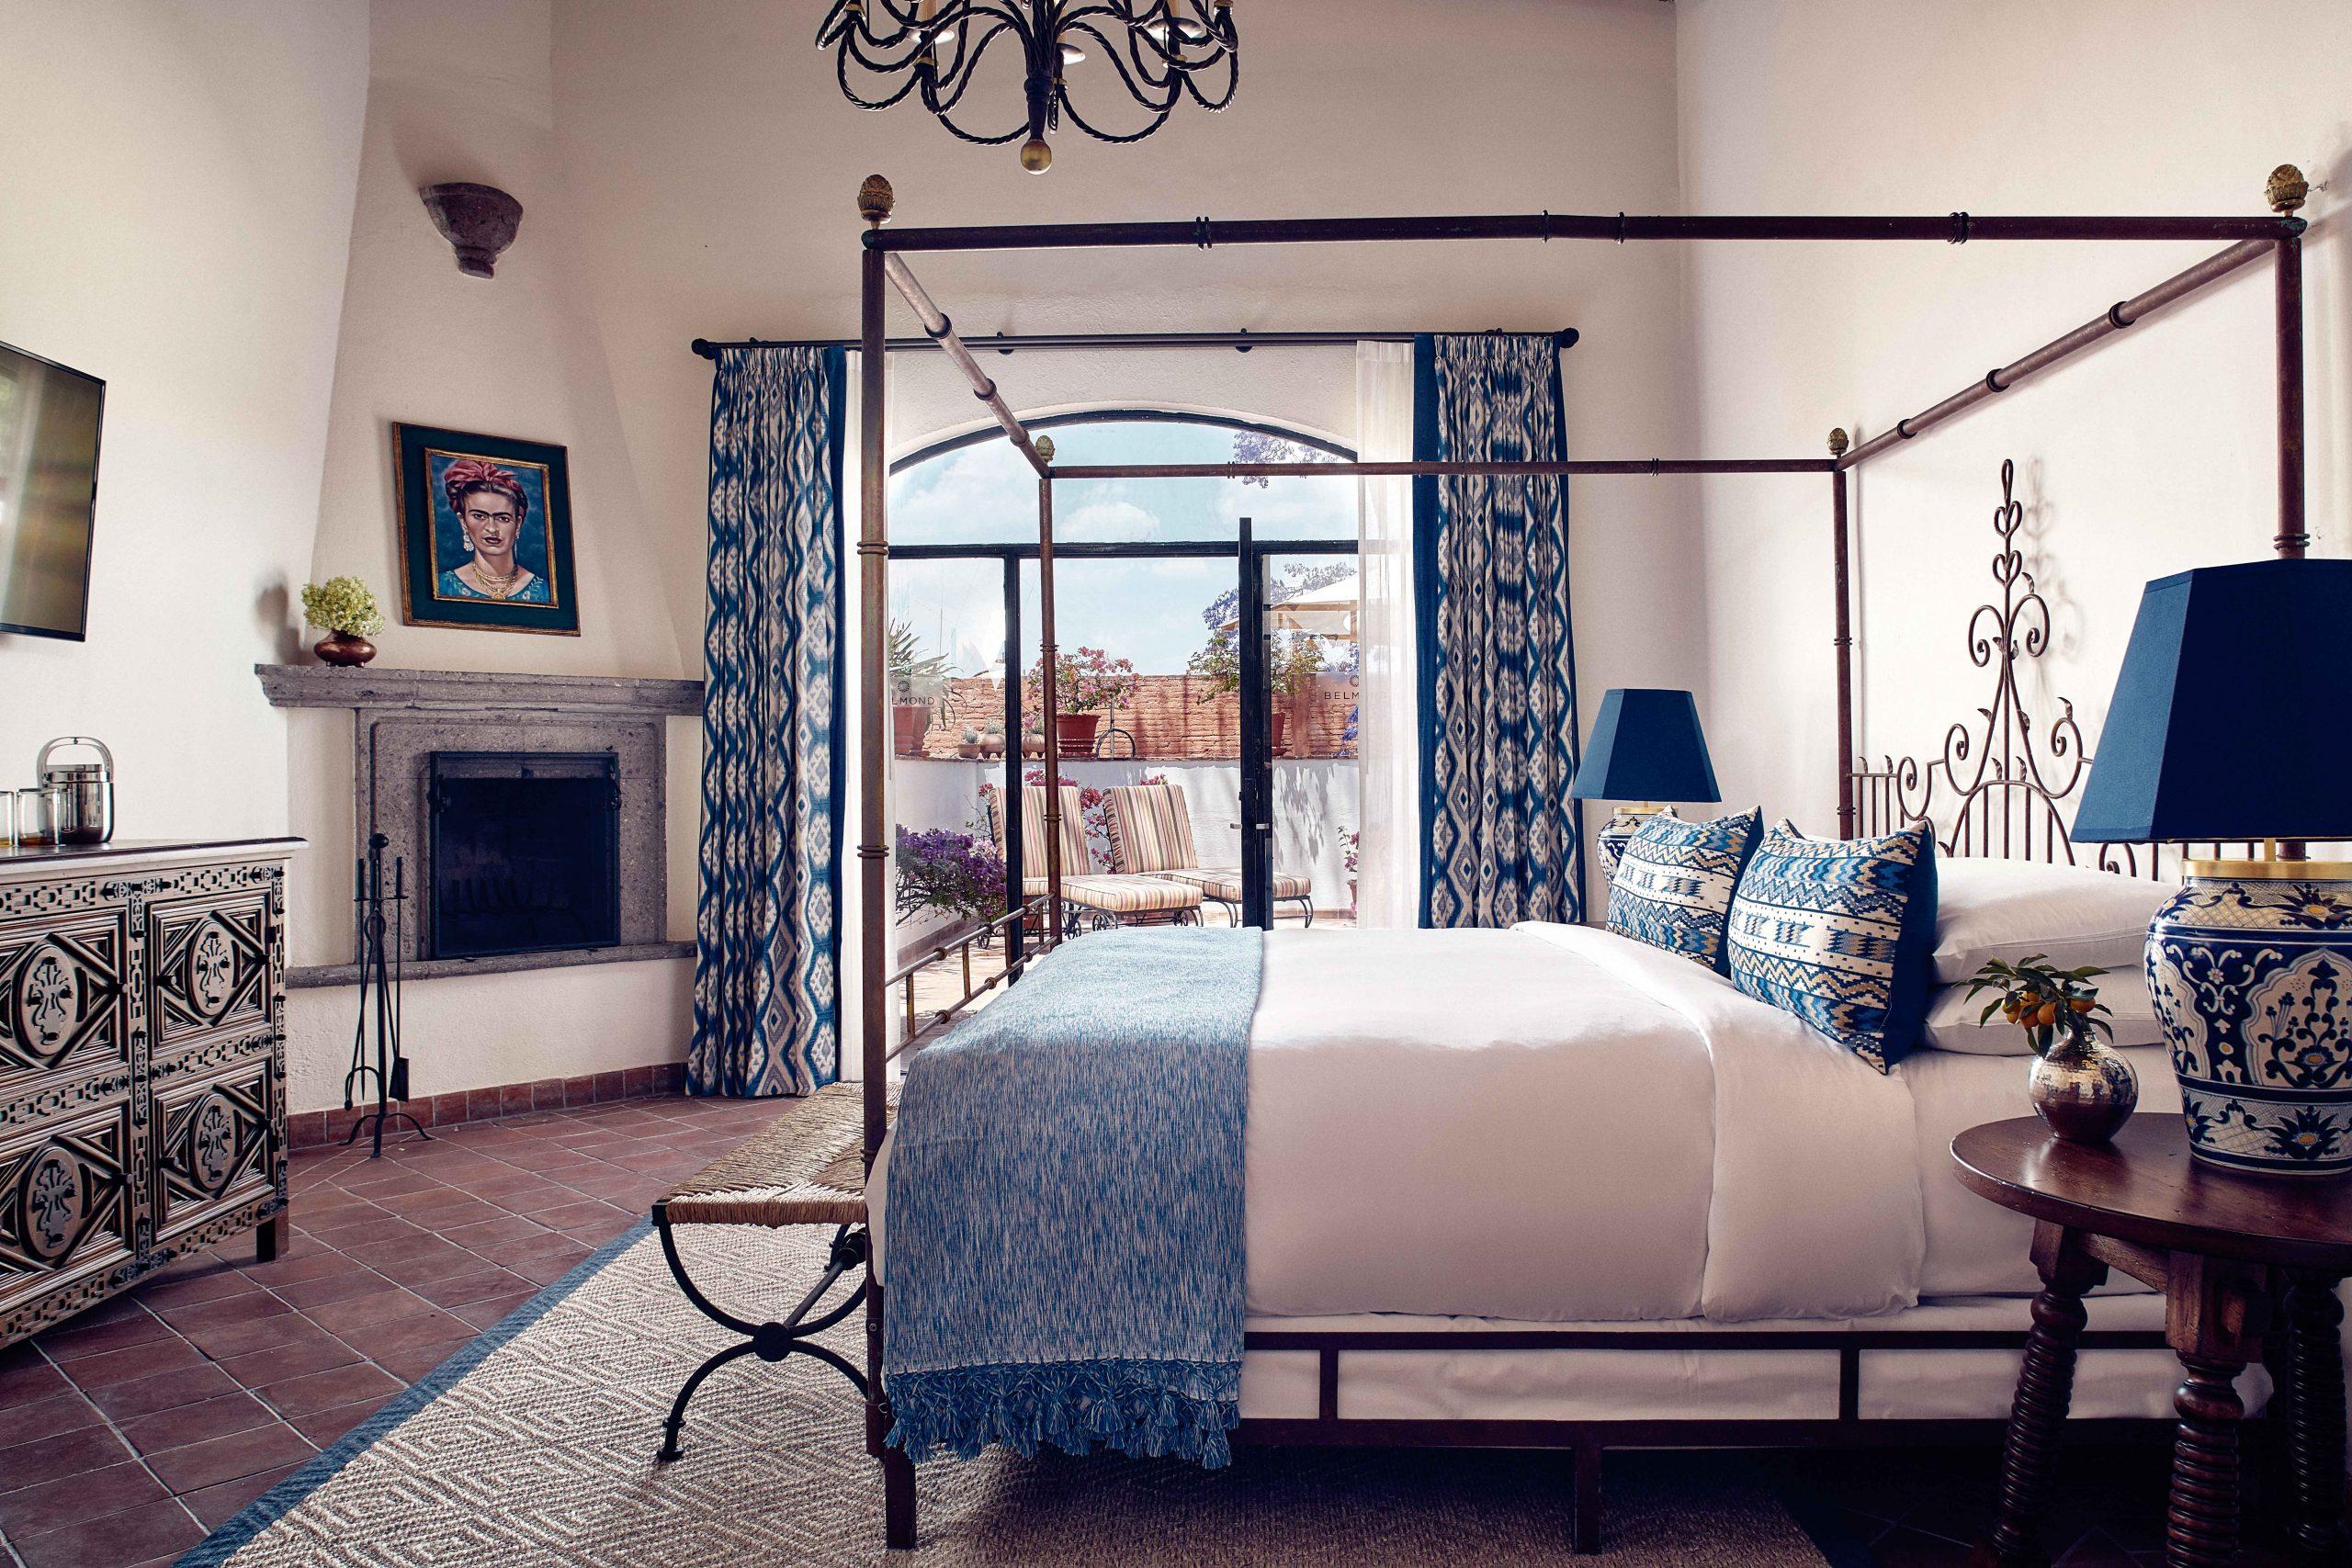 Belmond suites